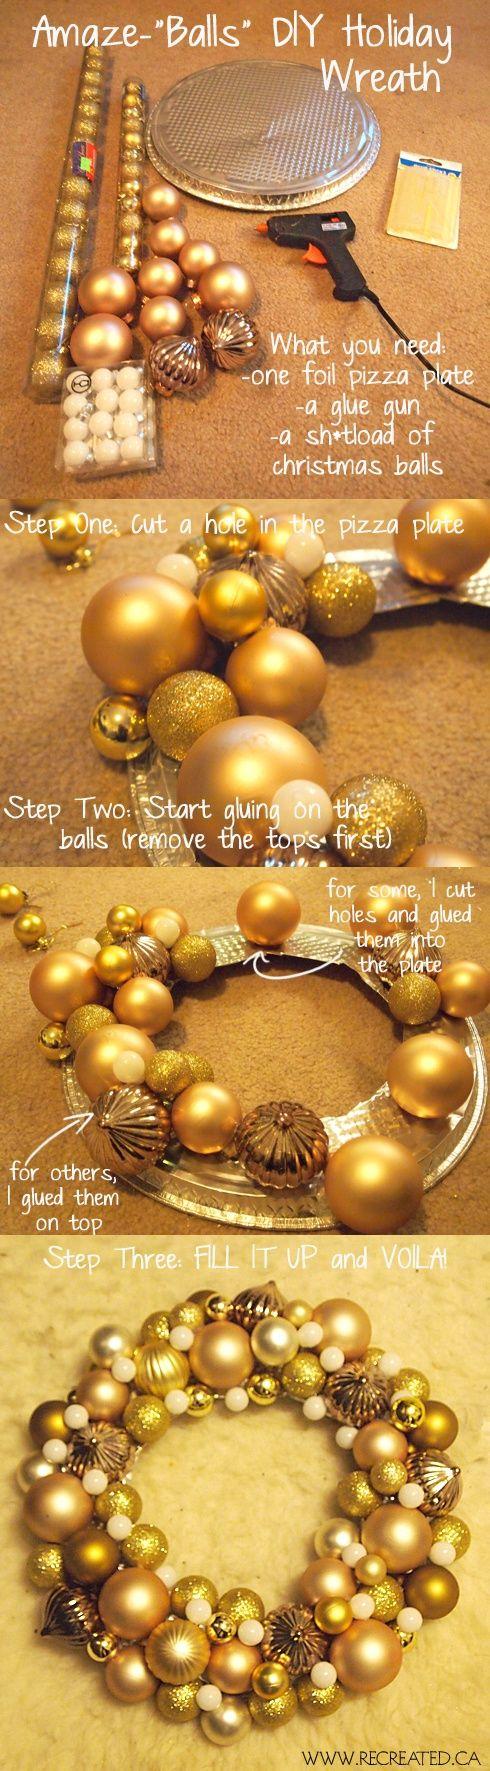 festividades make use of all those extra Christmas tree ornaments..